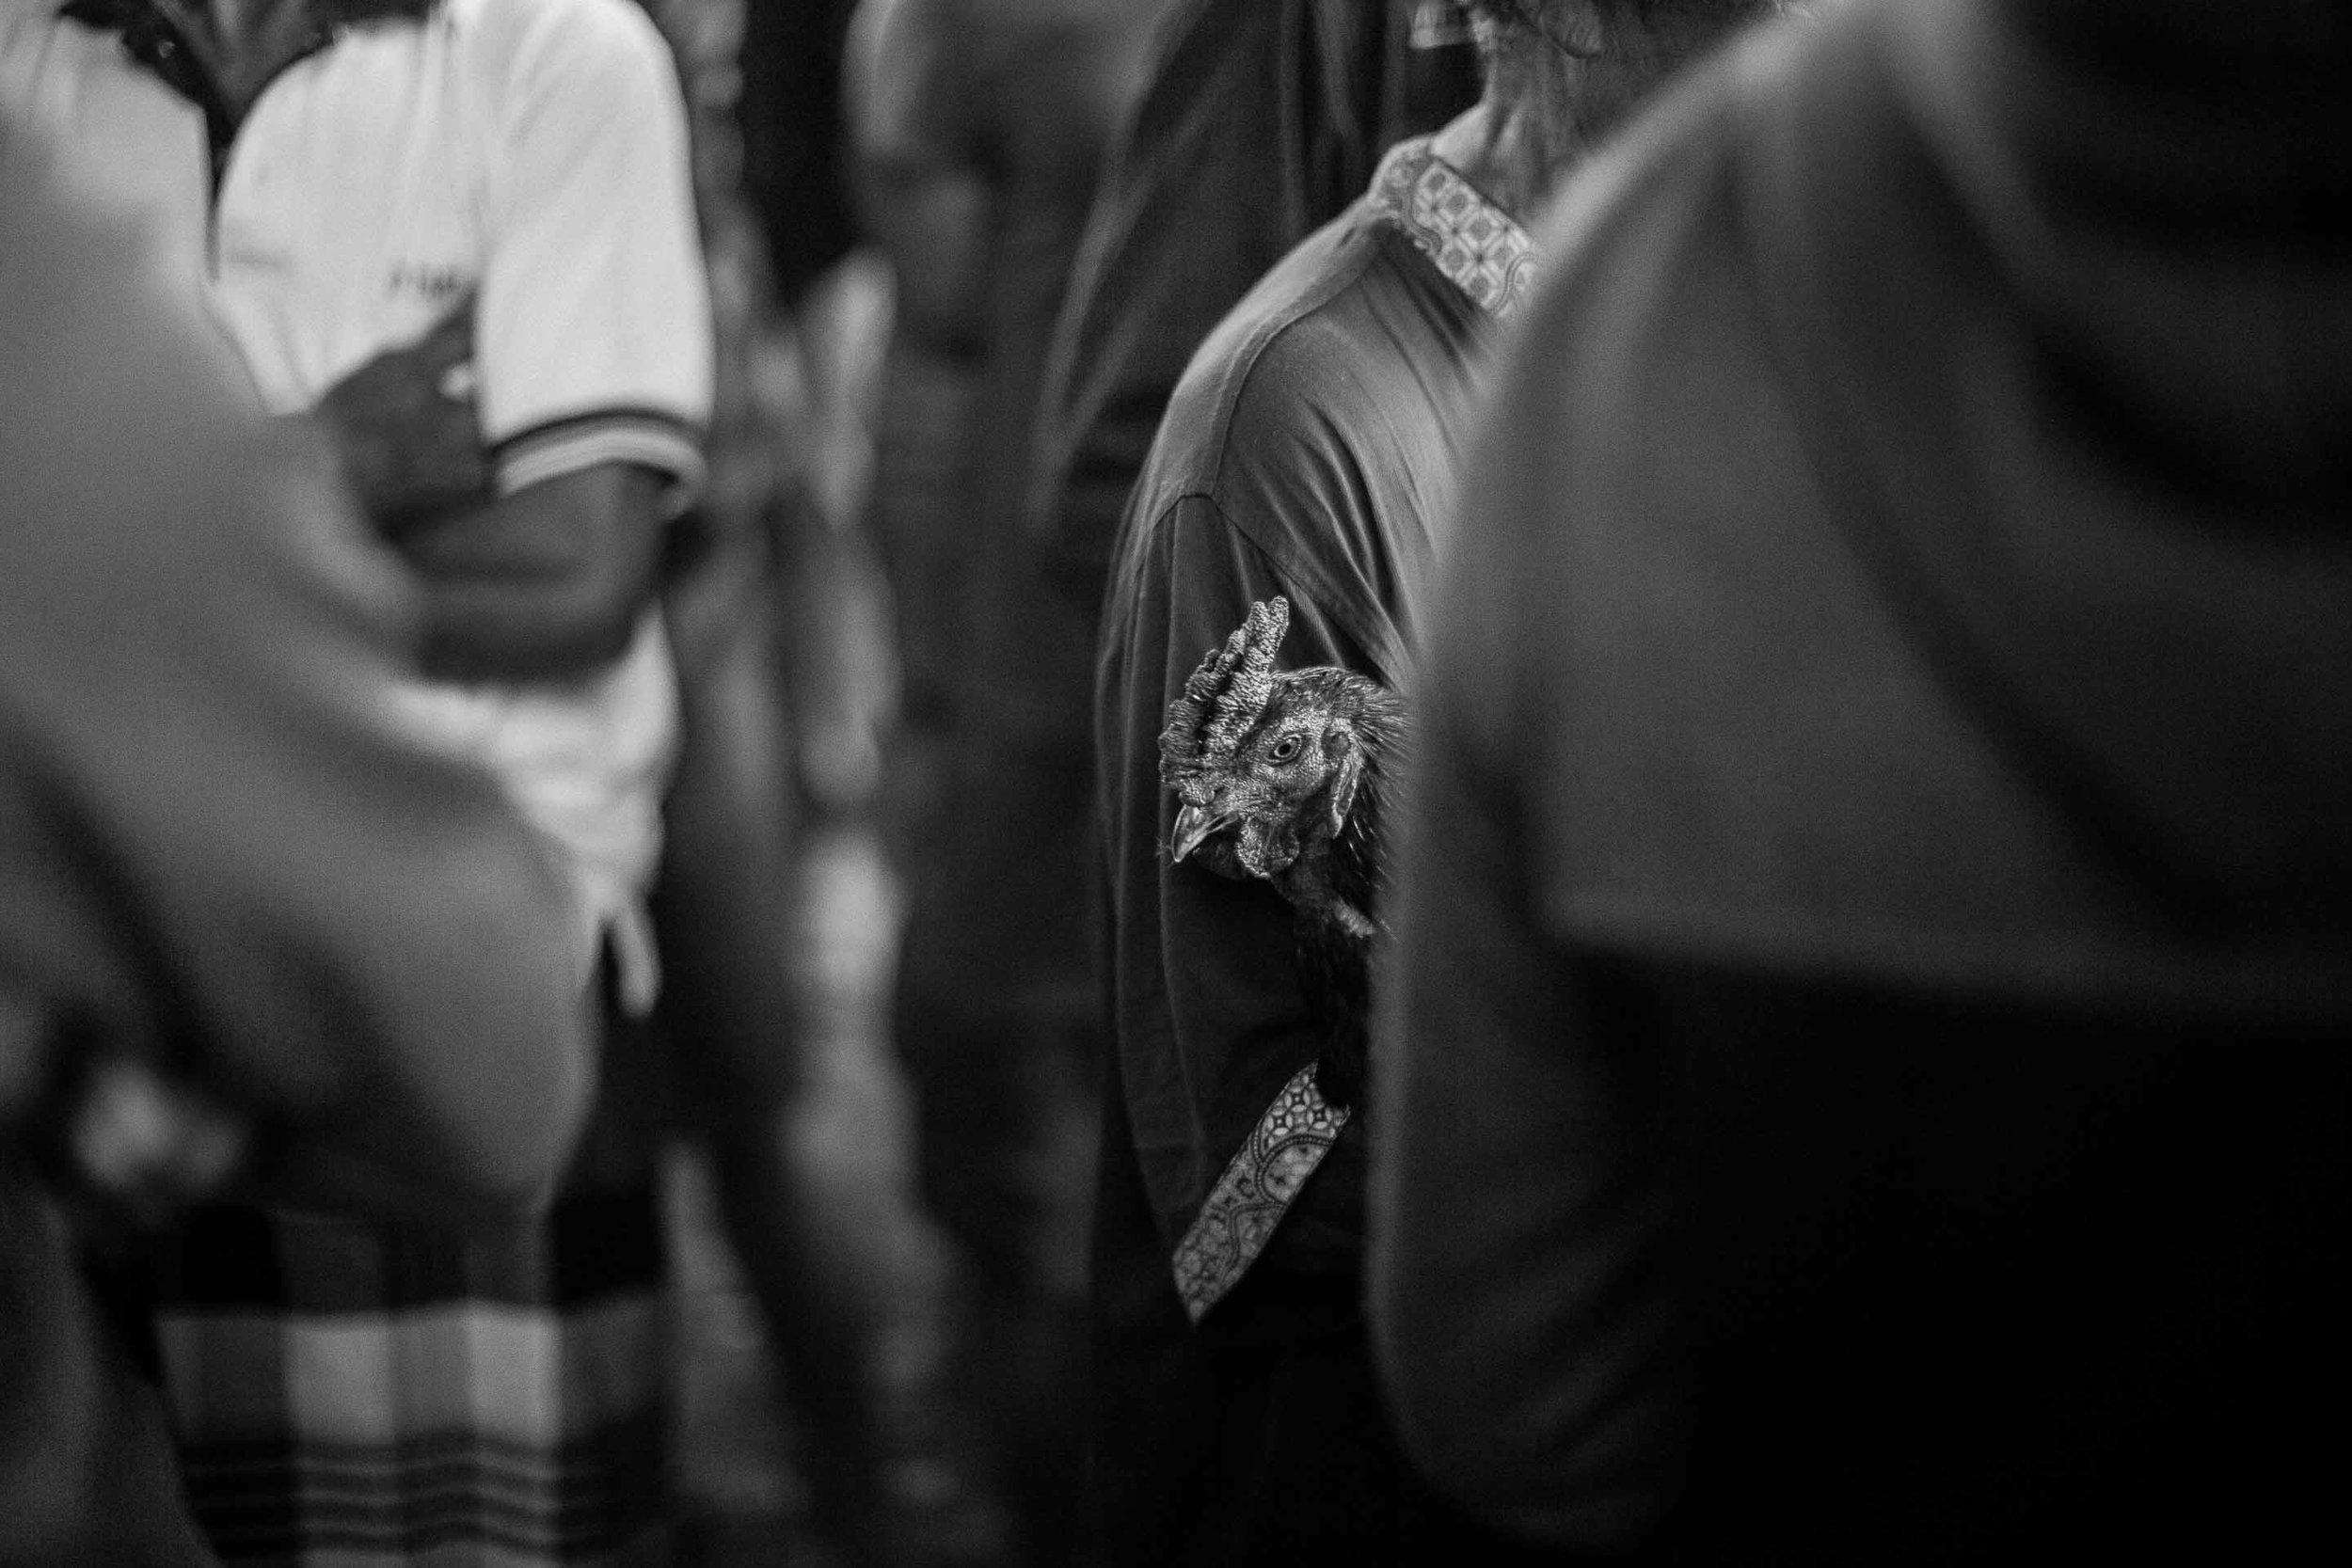 © Gareth Moon 2017 Tajen - Traditional cockfighting in Bali © Gareth Moon 2017